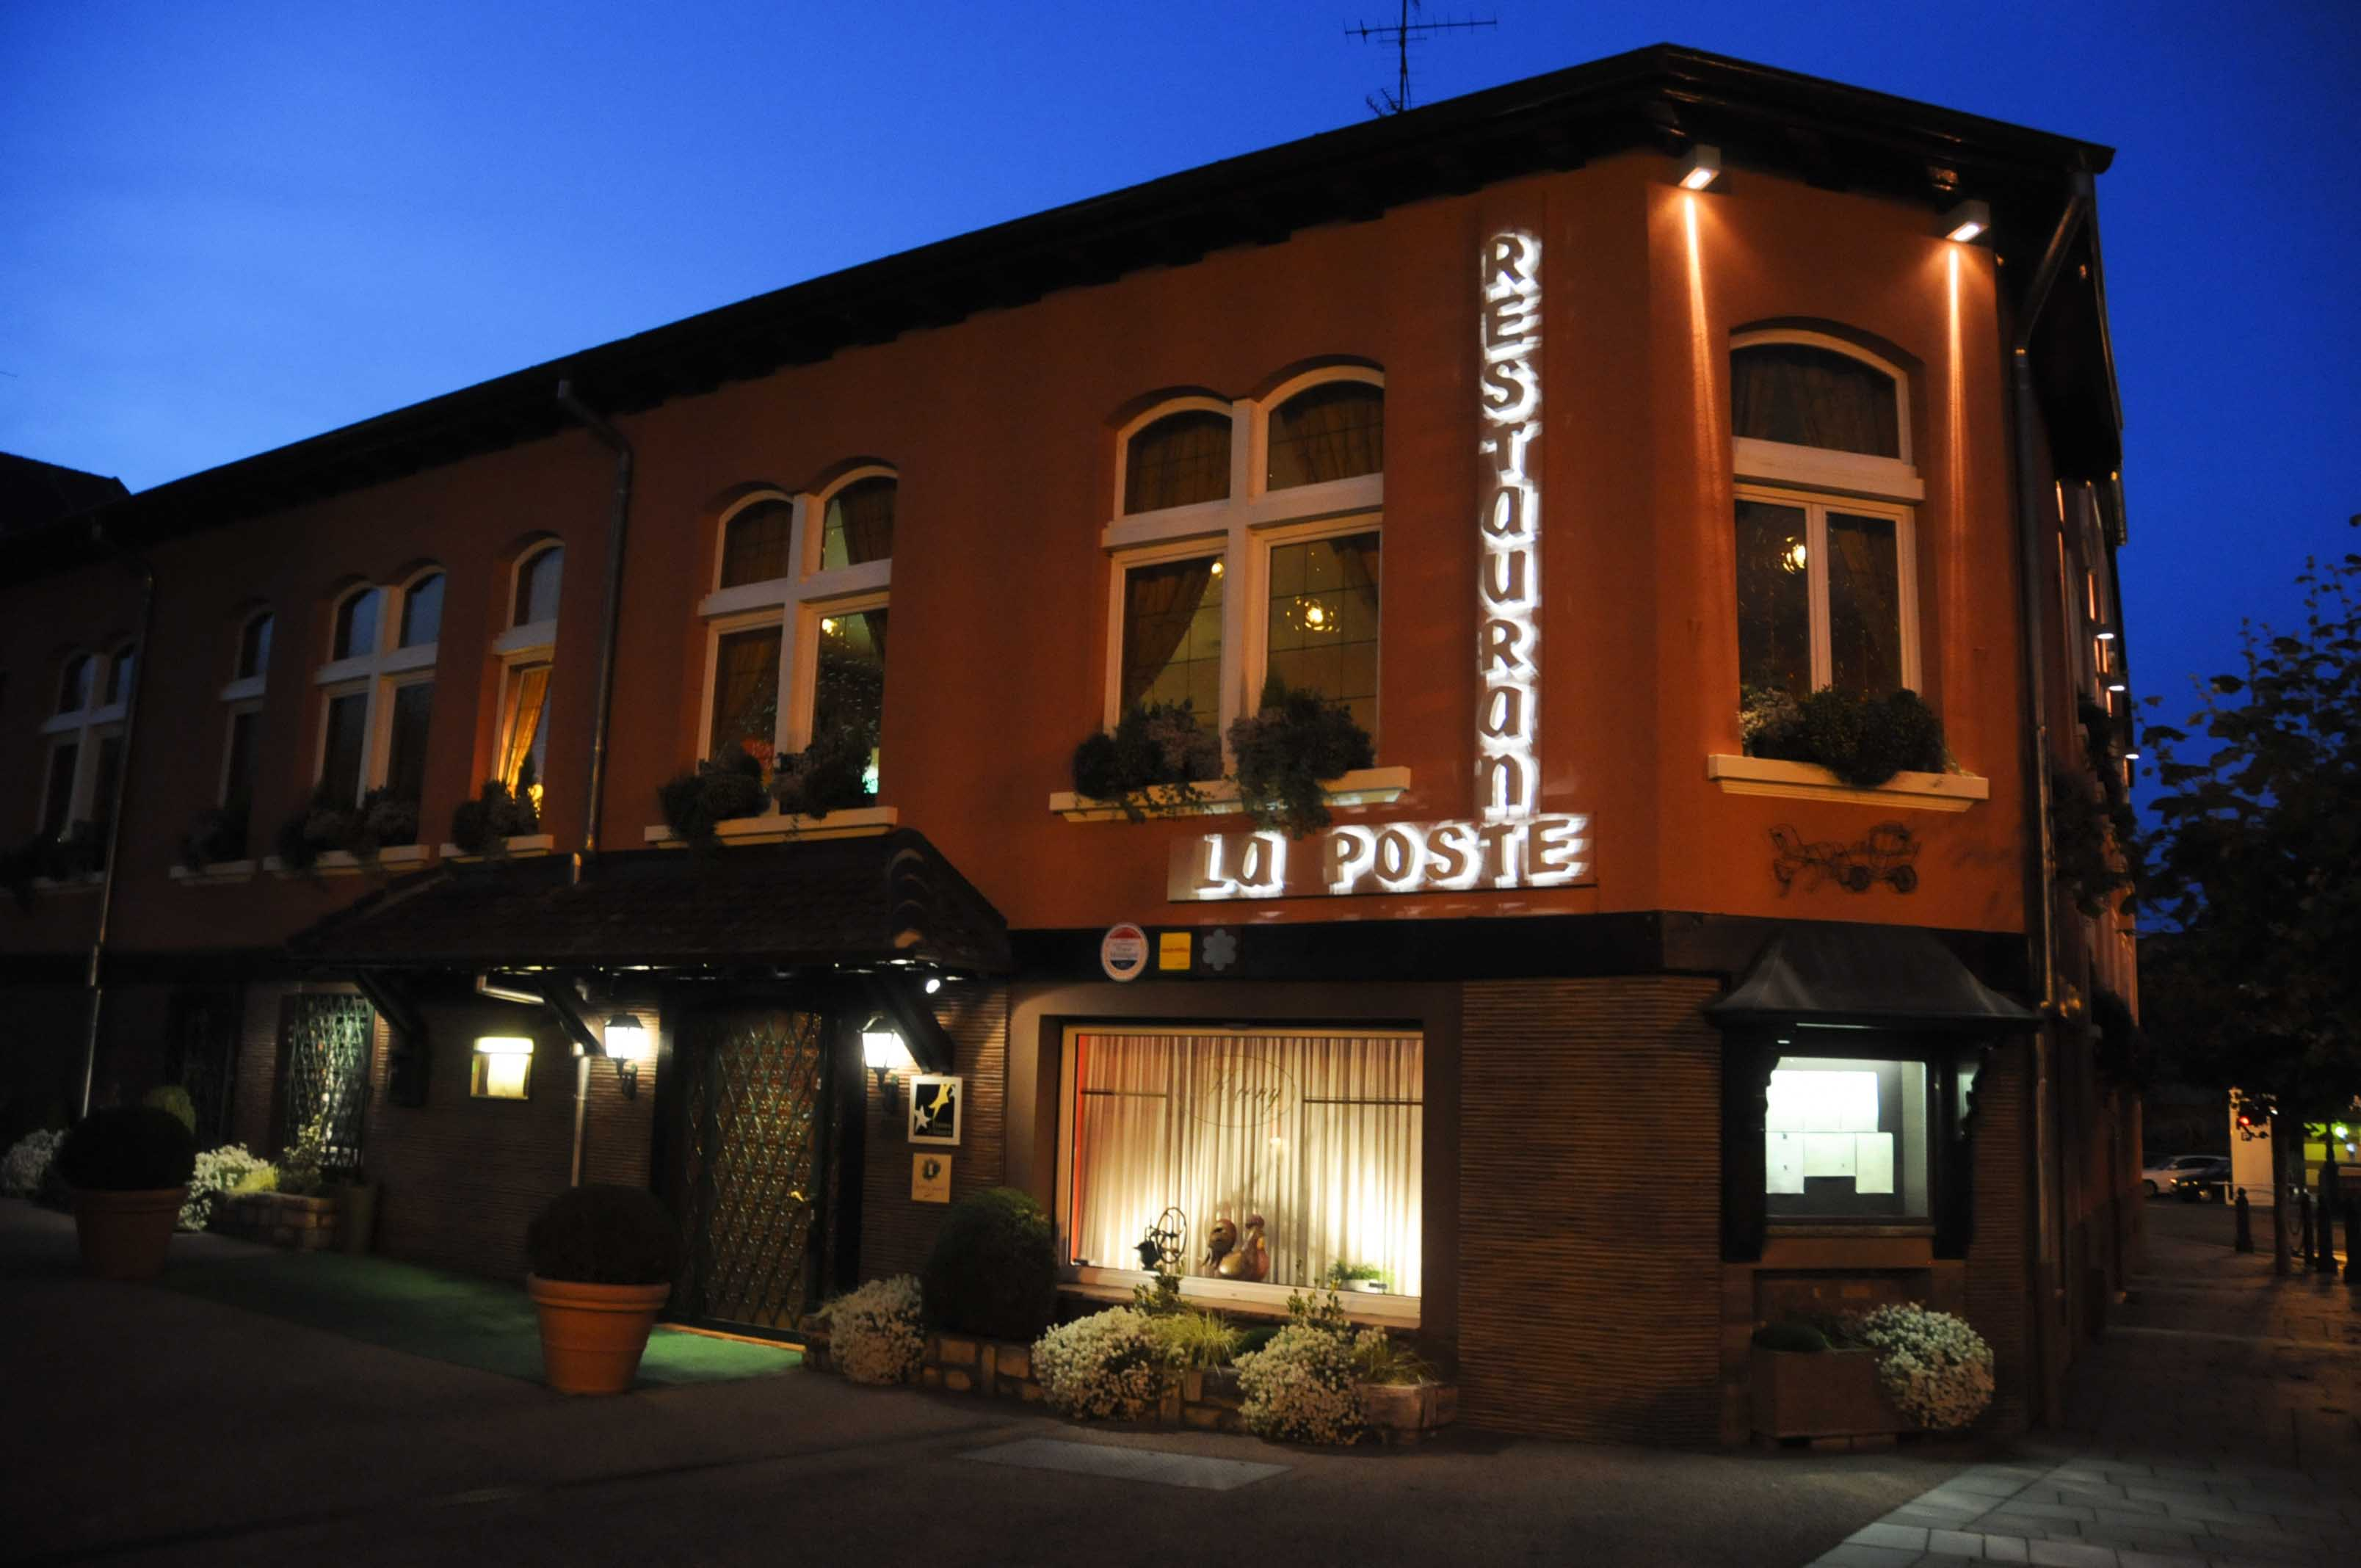 Dîner au restaurant La Poste à Riedisheim, chez Jean Marc Kieny (1 étoile Michelin)